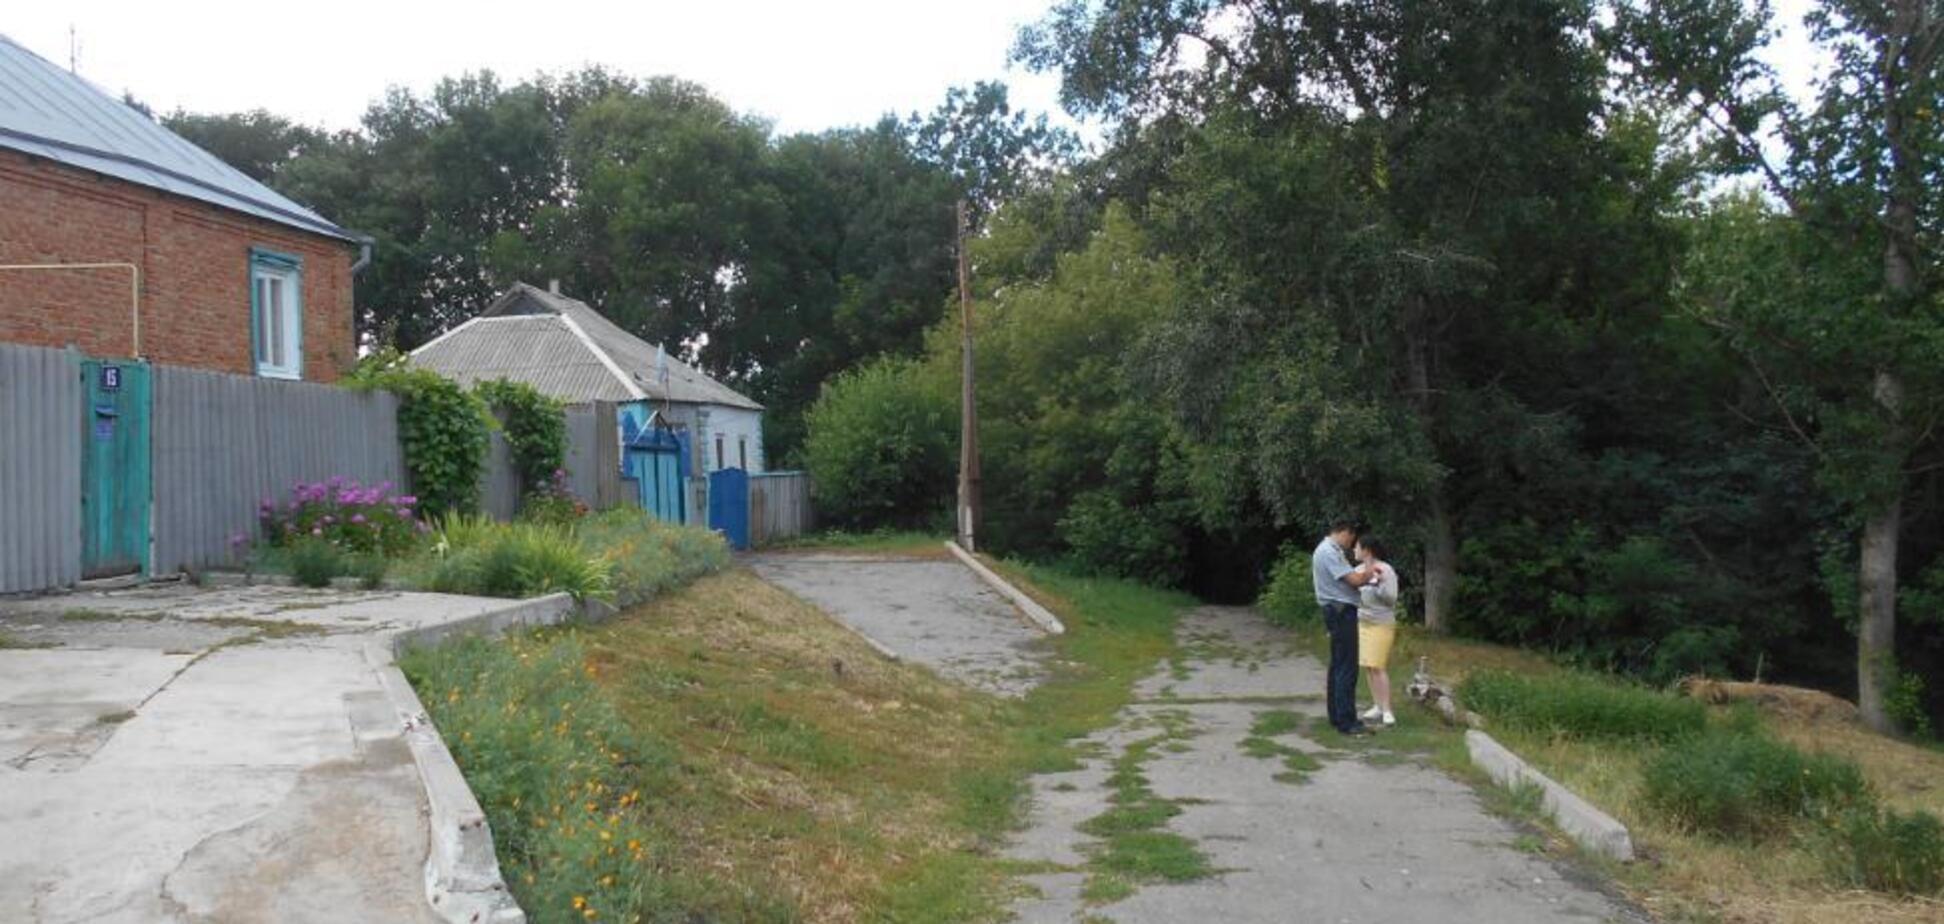 Завязал глаза и резал: на Харьковщине извращенец сутки насиловал девушку. Фото